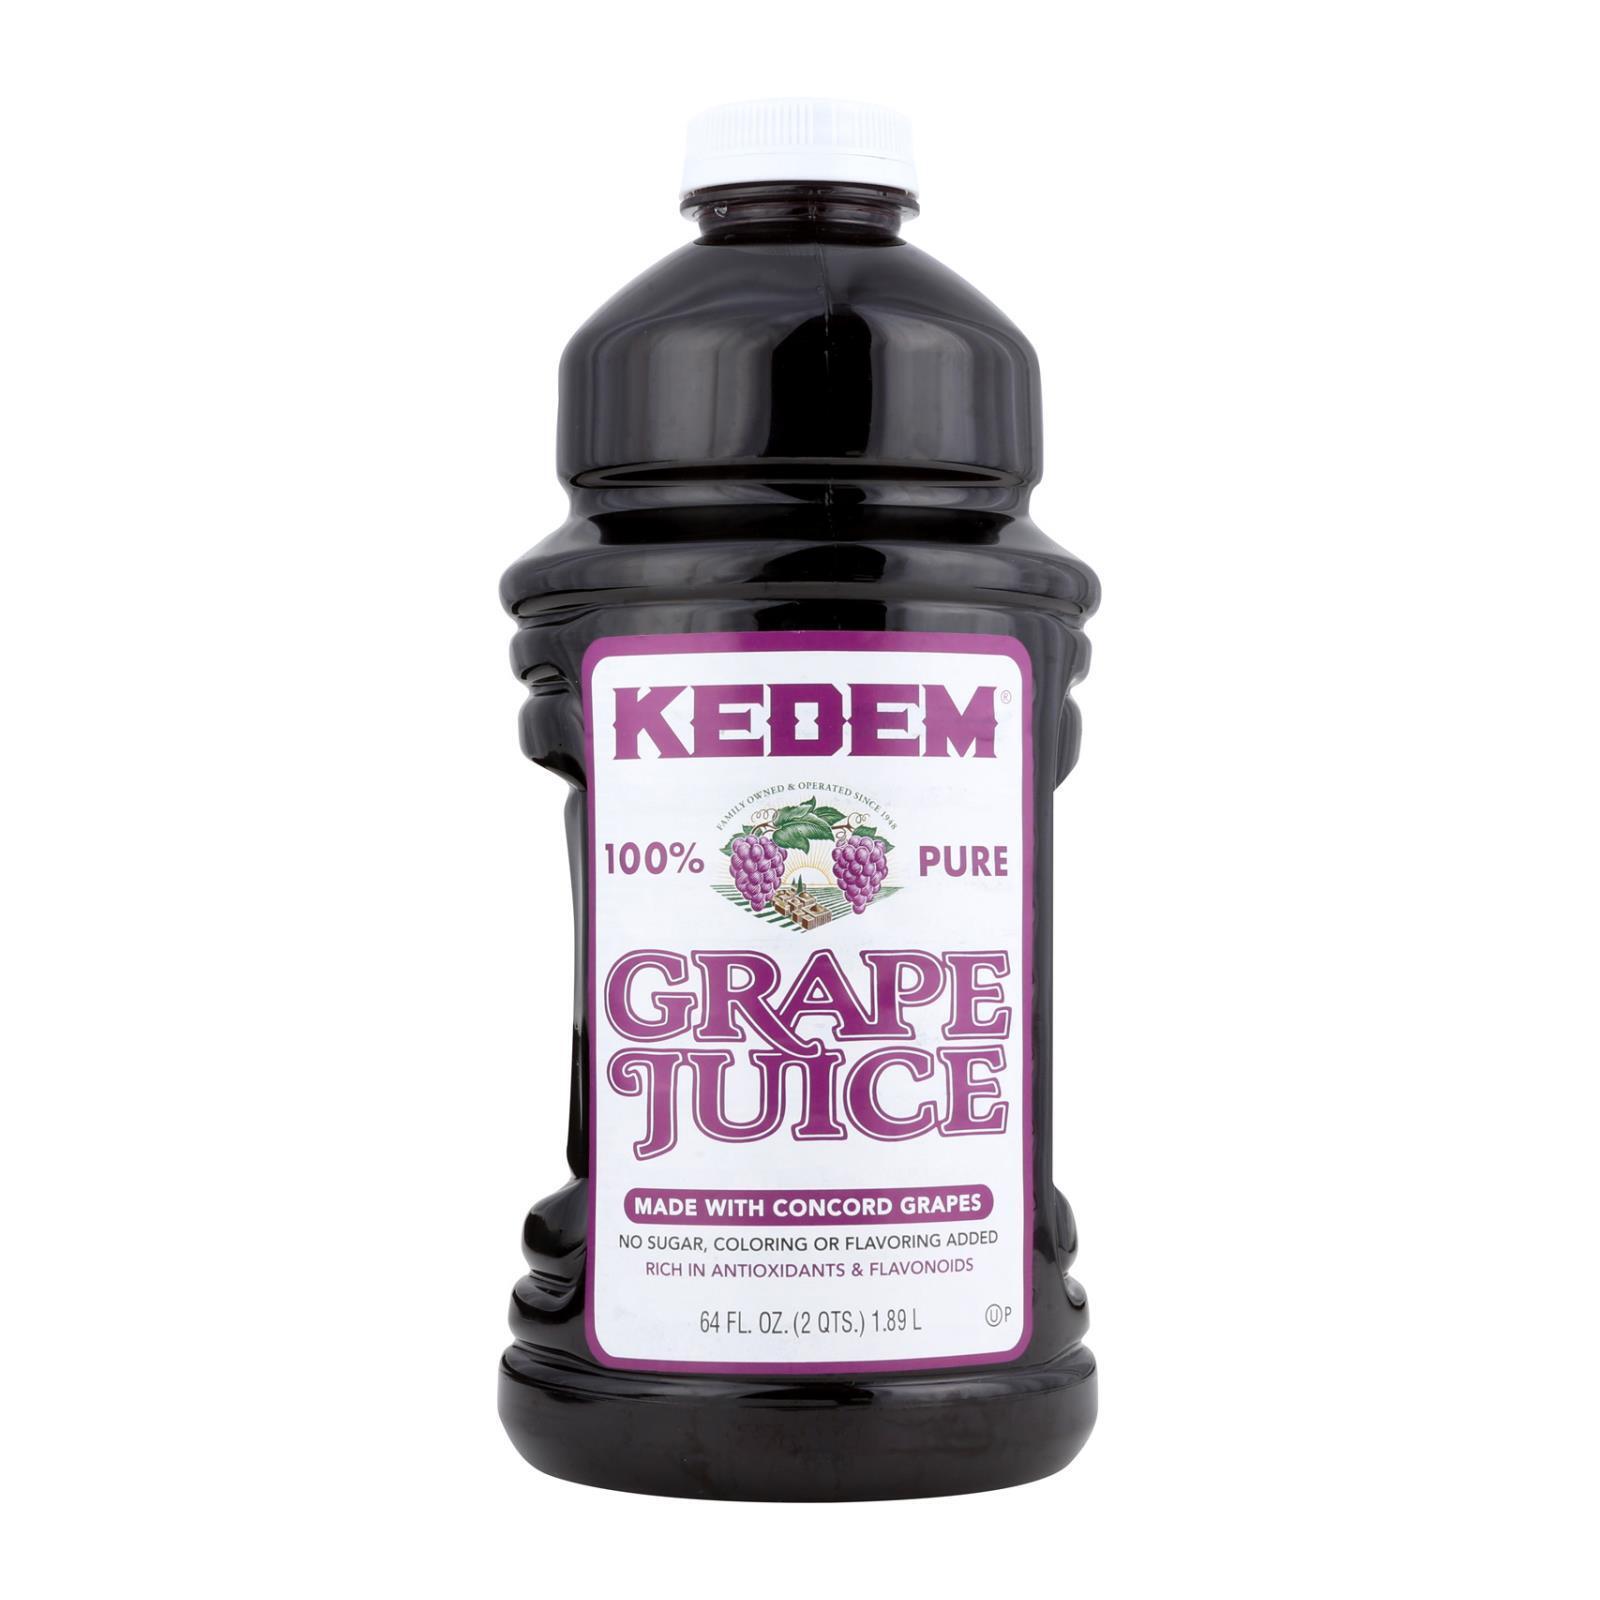 Kedem Grape Juice - Case of 8 - 64 Fl oz.